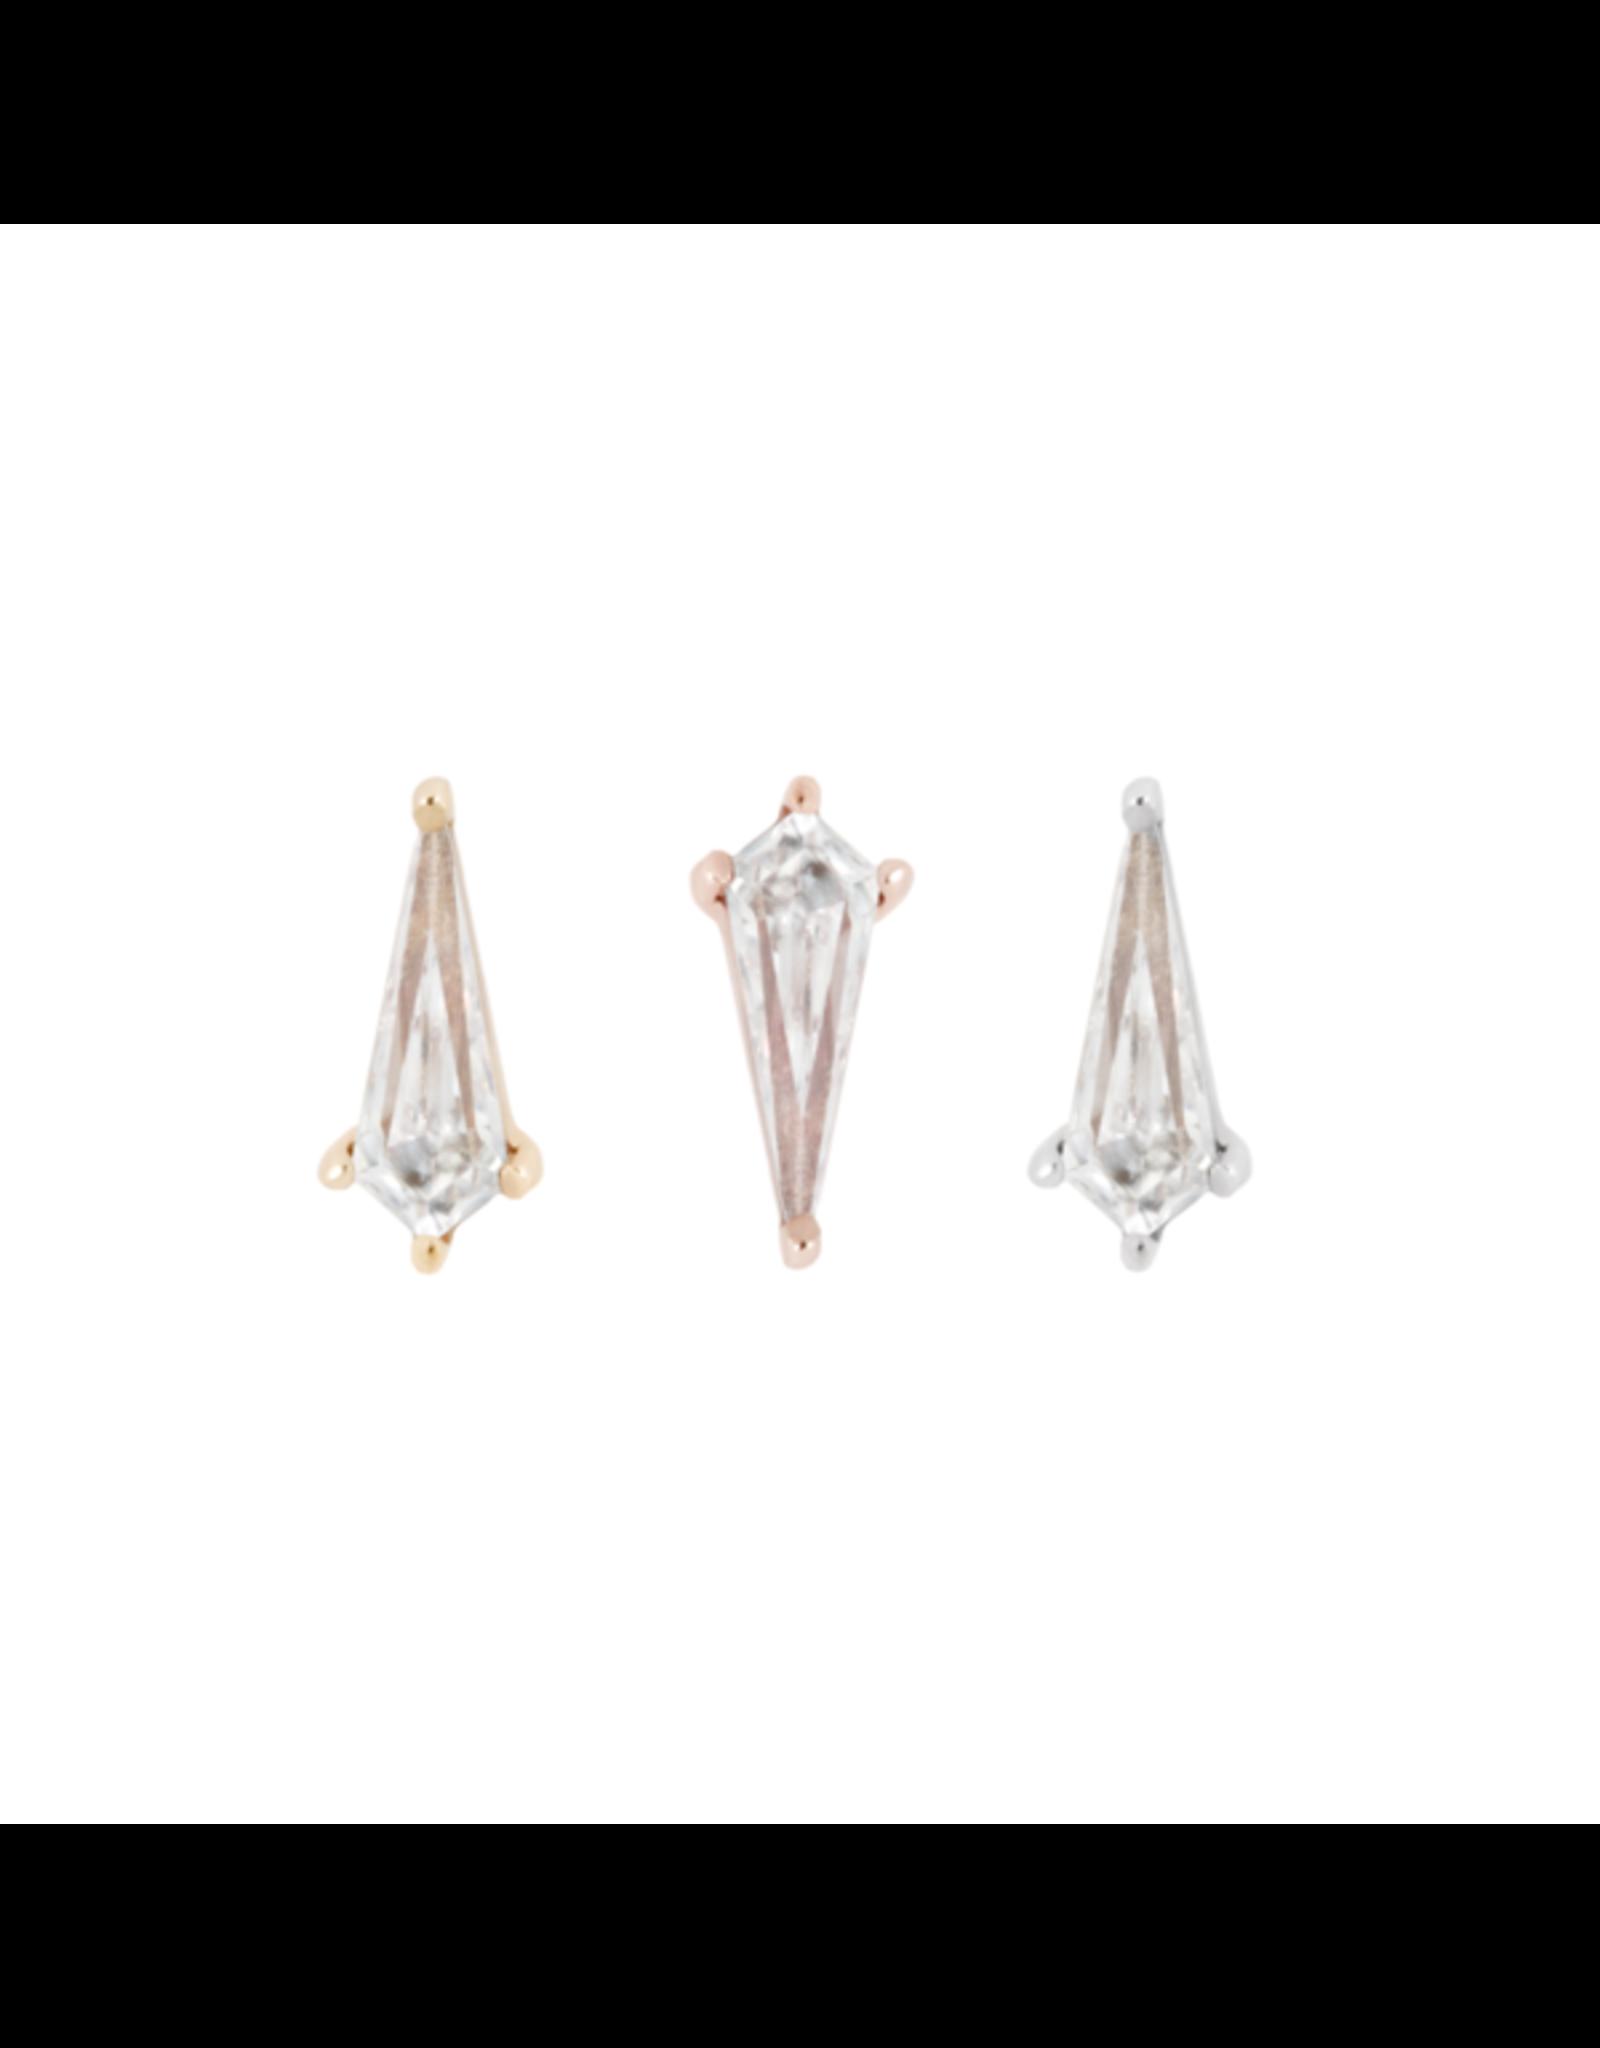 "Buddha Jewelry Organics  Buddha Jewelry Organics  ""Soho"" press-fit end with 8x3.5 kite cut CZ"